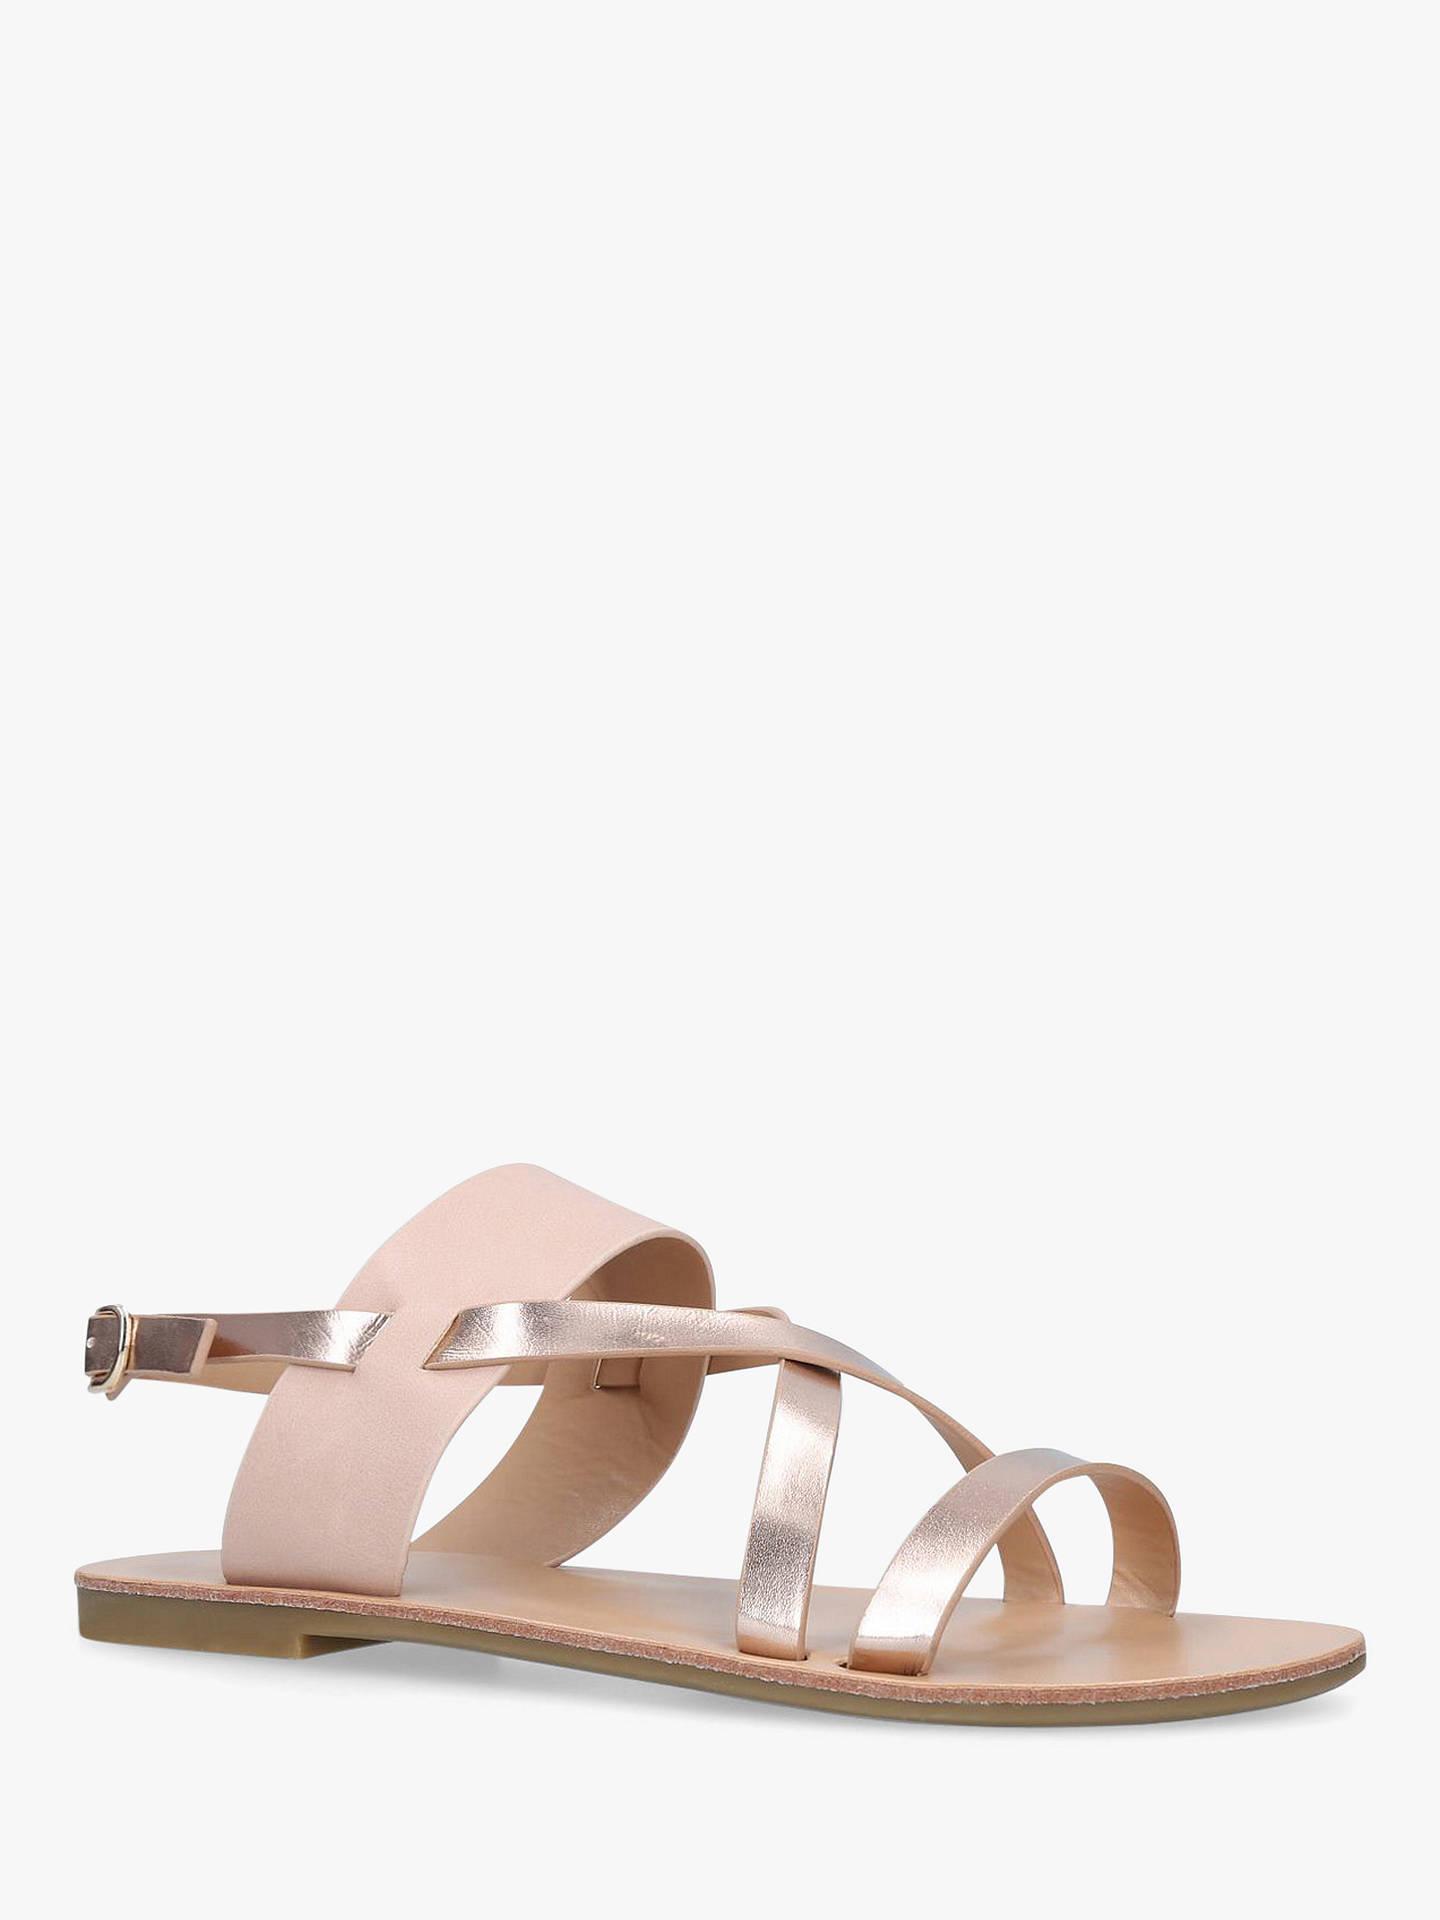 0b7c5f5b5 Carvela Brink Strappy Flat Sandals at John Lewis   Partners